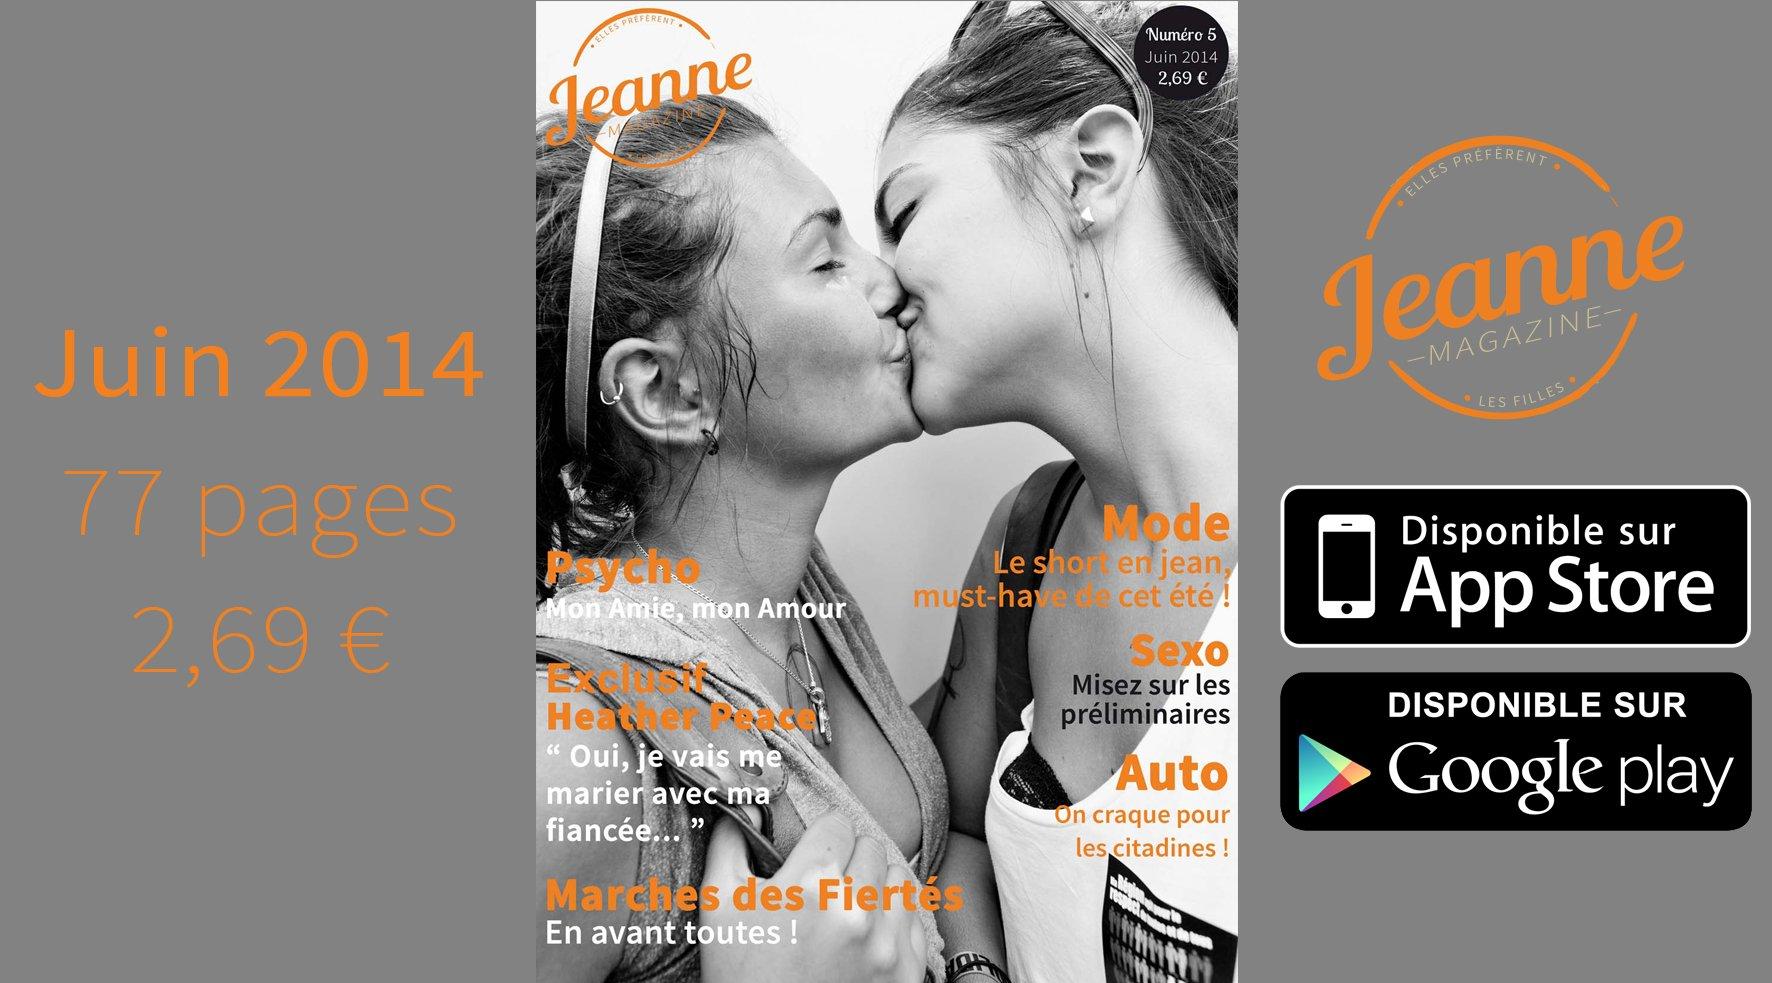 Jeanne Magazine n°5 – juin 2014